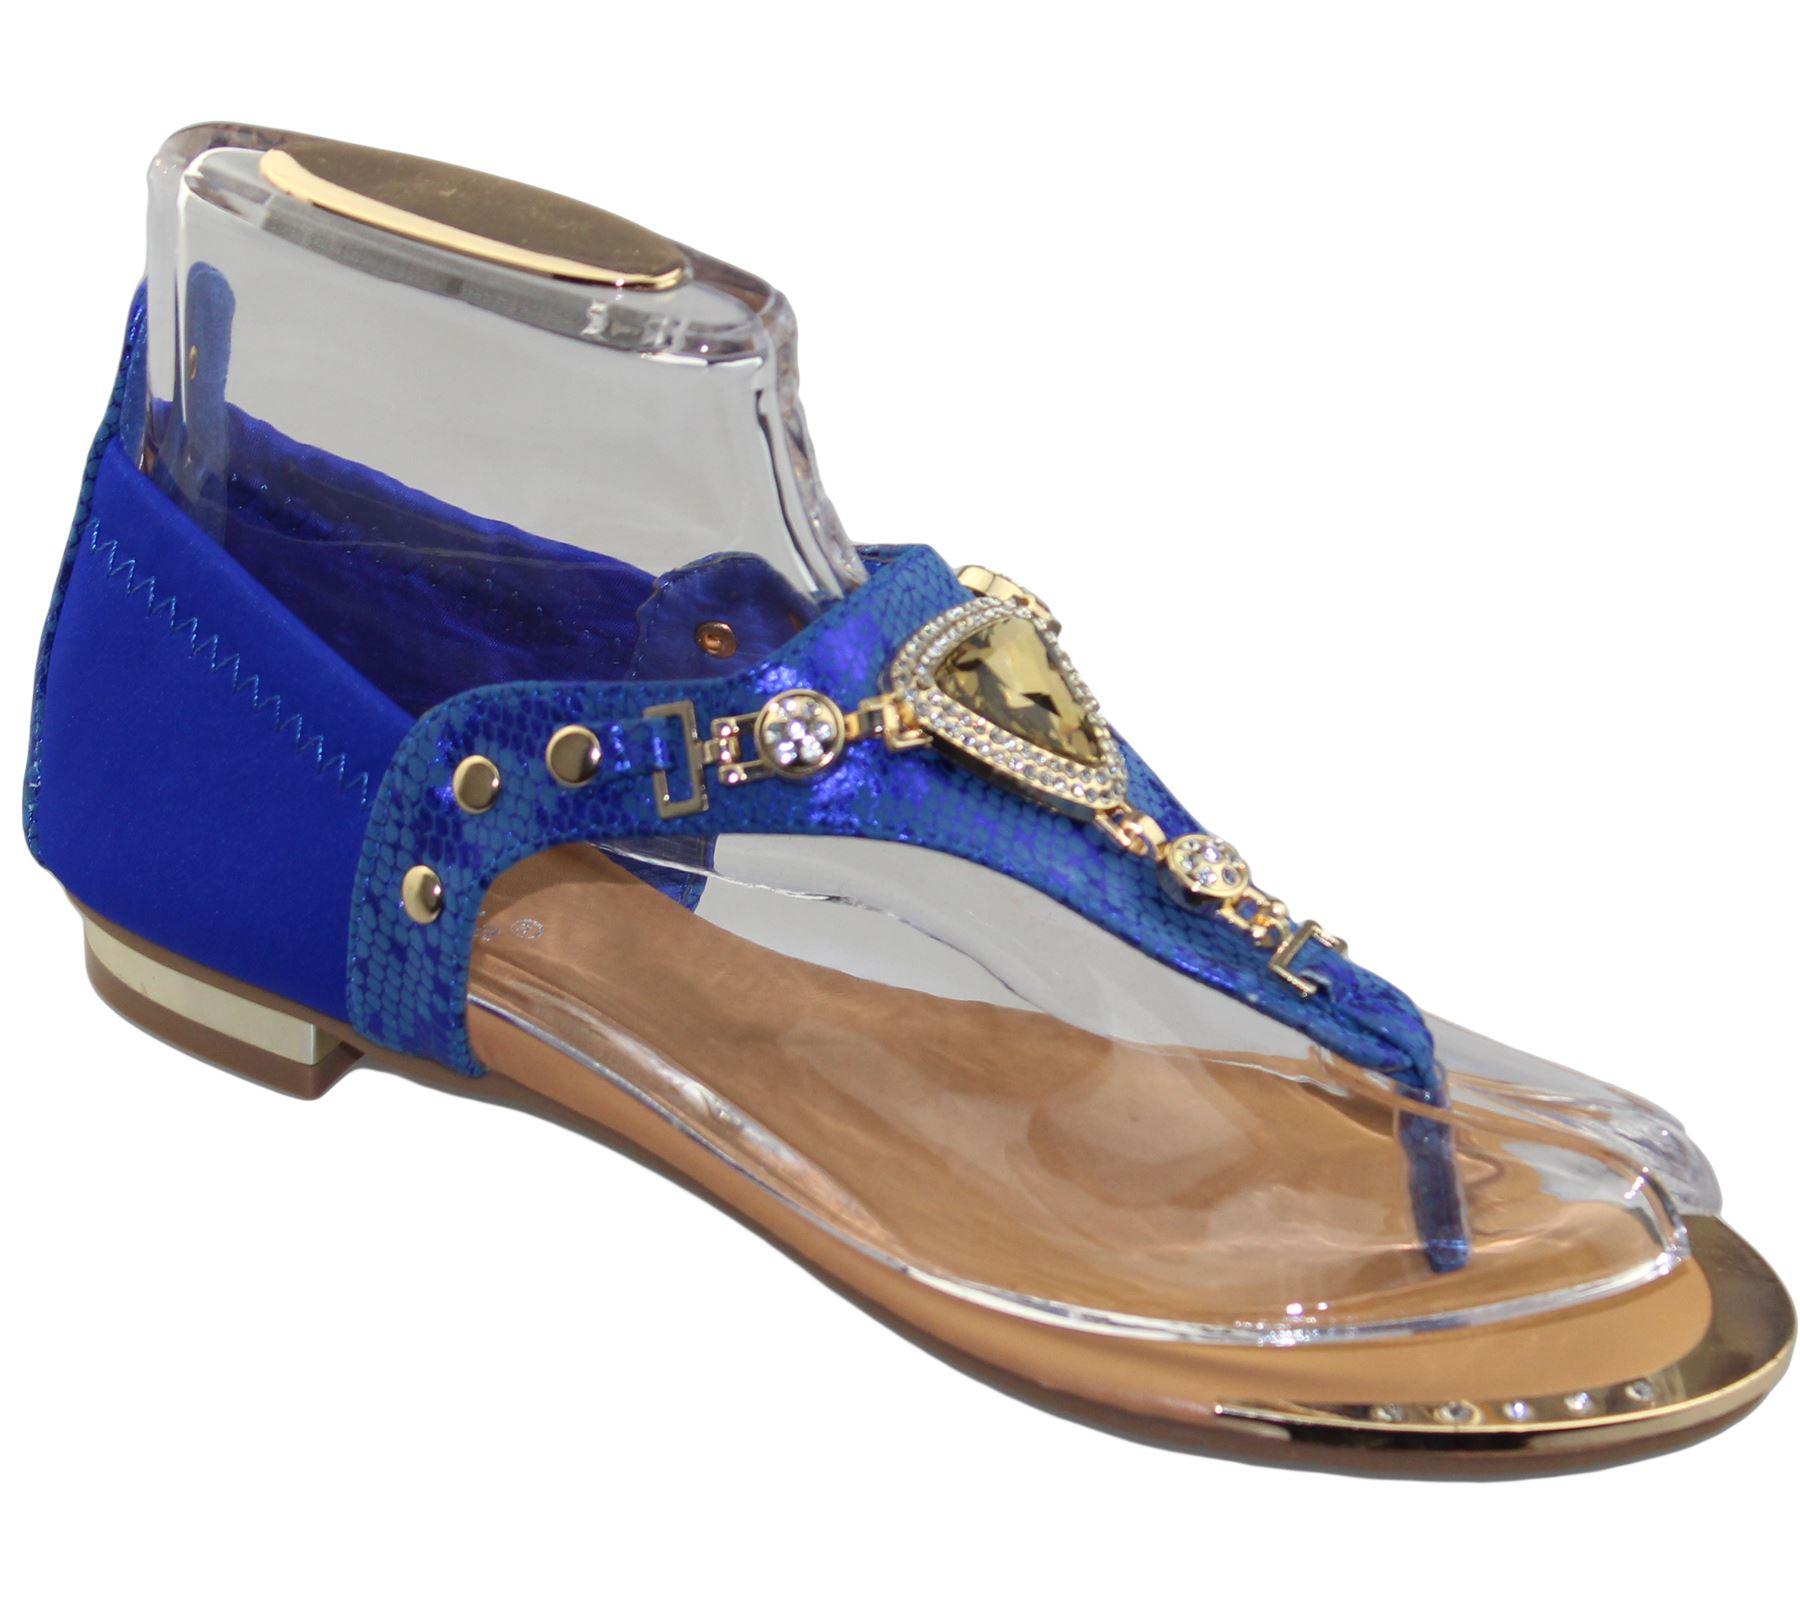 Womens-Flat-Summer-Sandals-Ladies-Diamante-Wedding-Toe-Post-Casual-Slipper thumbnail 25